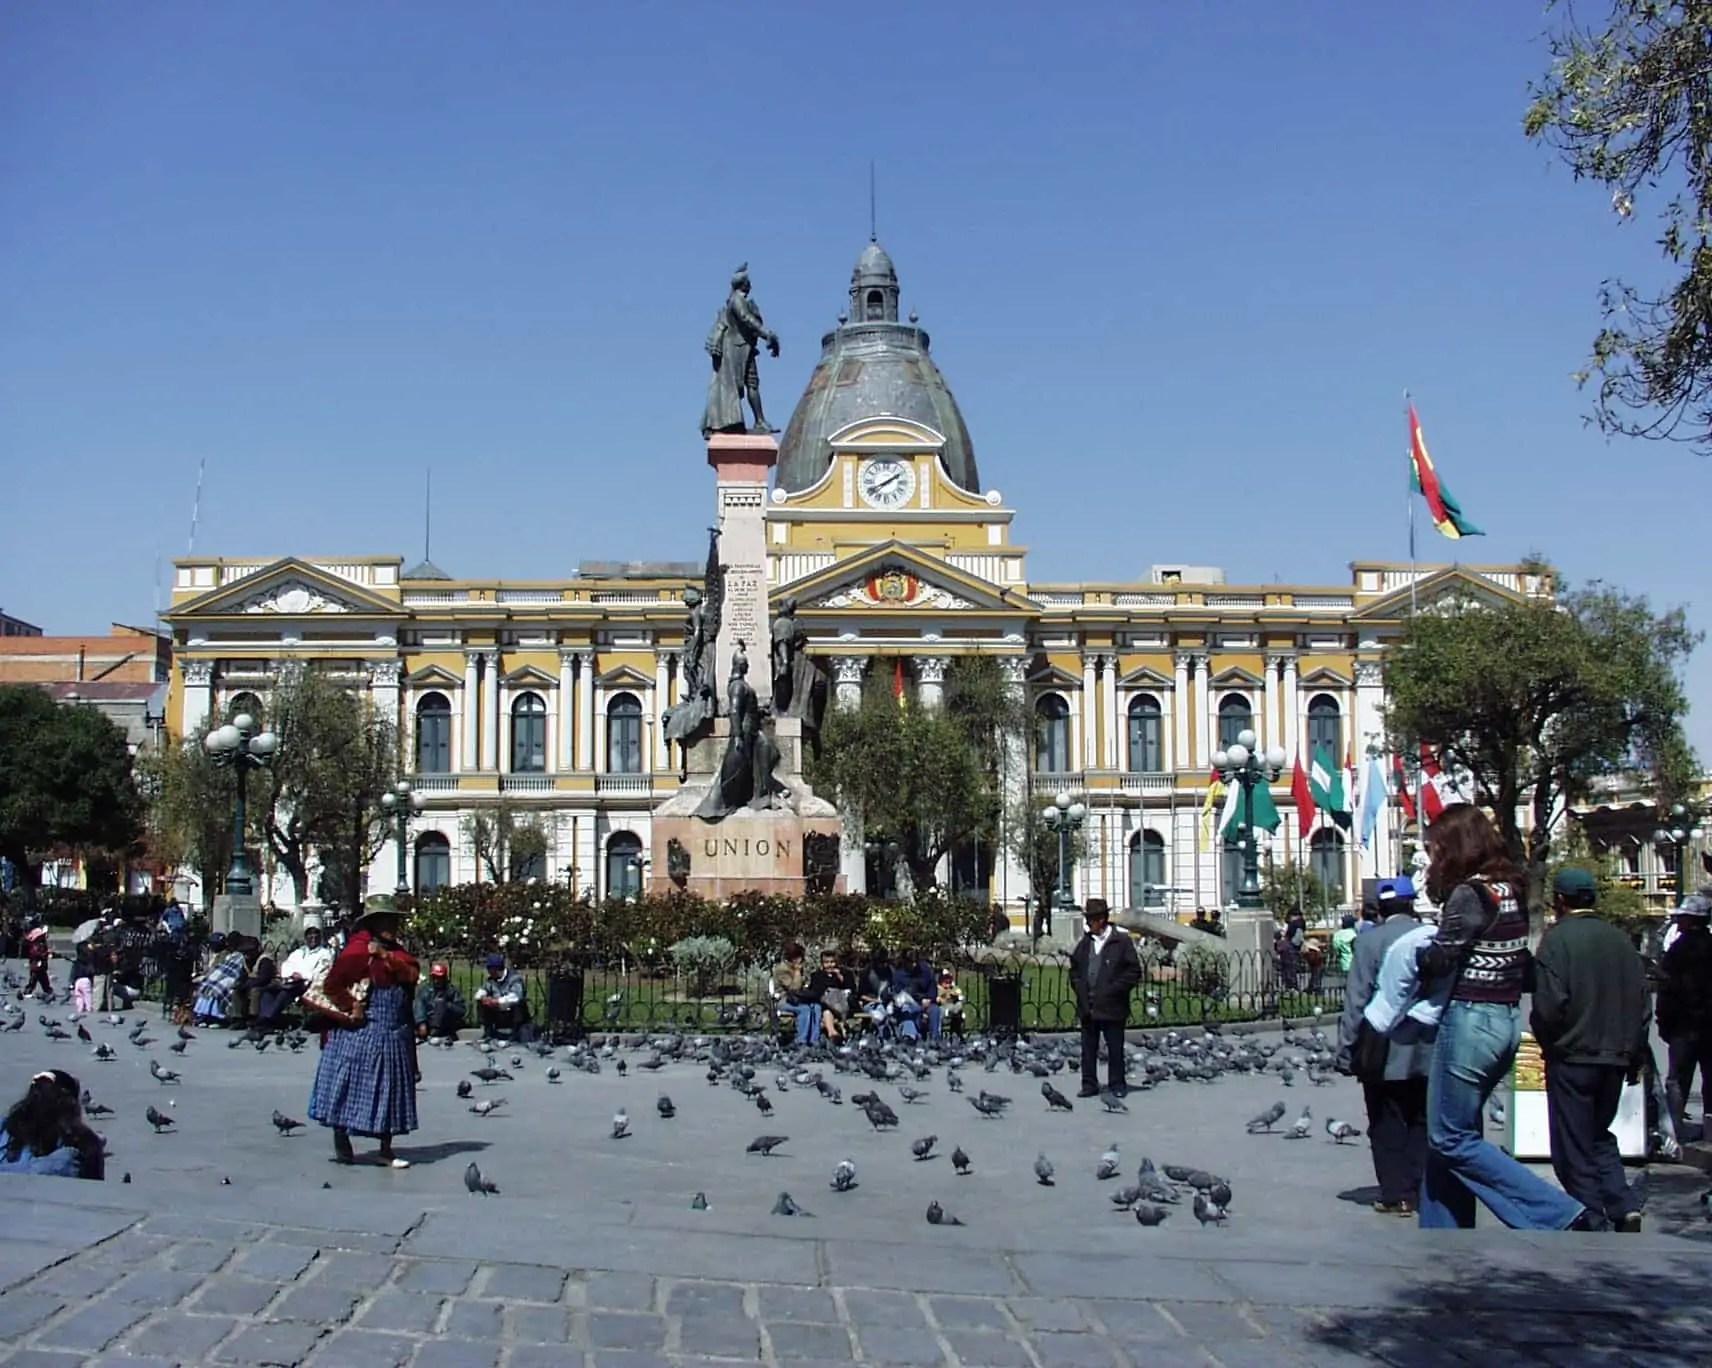 Bolivia's plurinational legislative assembly